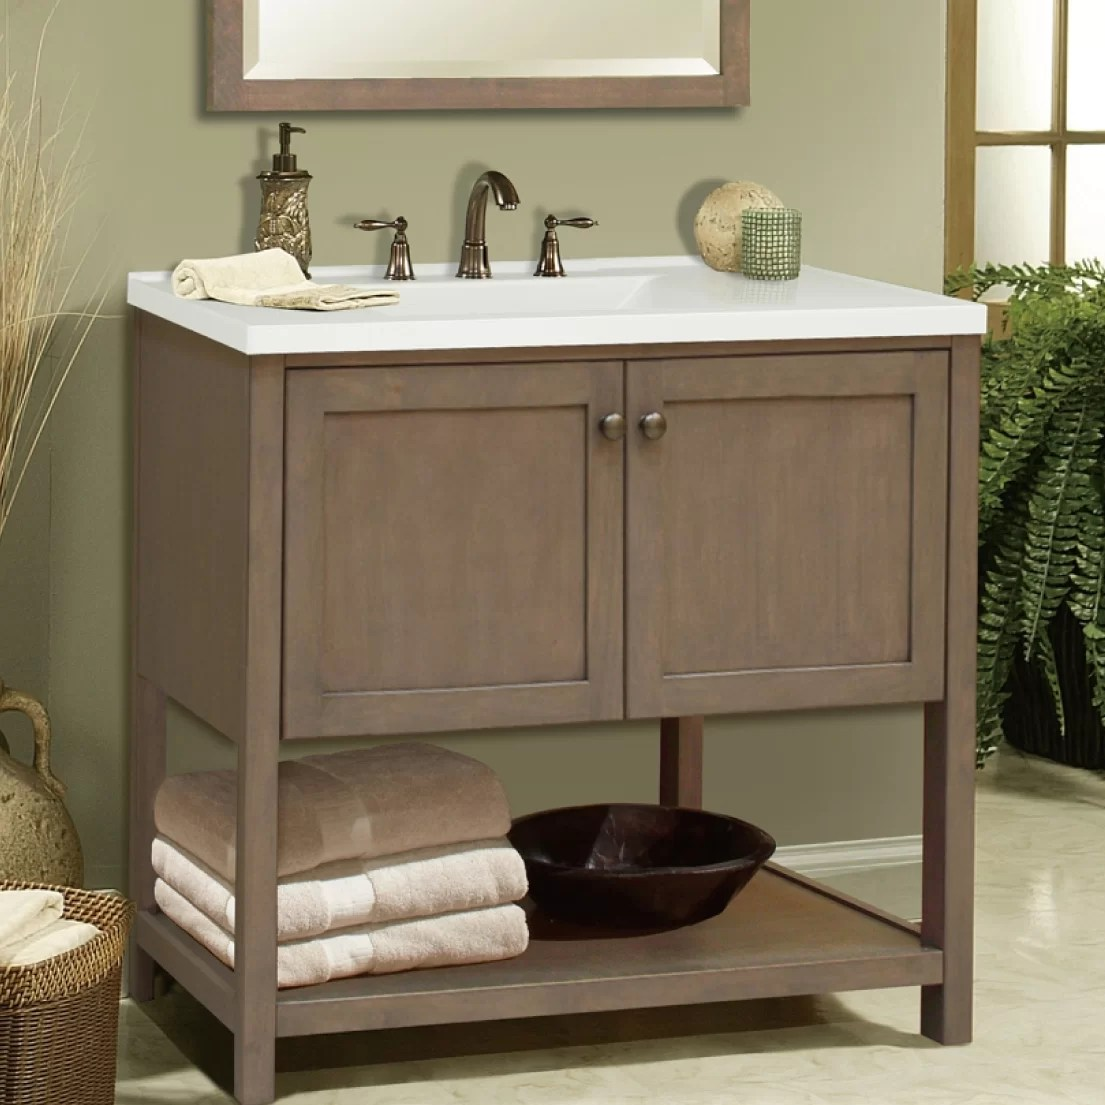 Sunnywood Aiden Bath 30 Bathroom Vanity Base  eBay